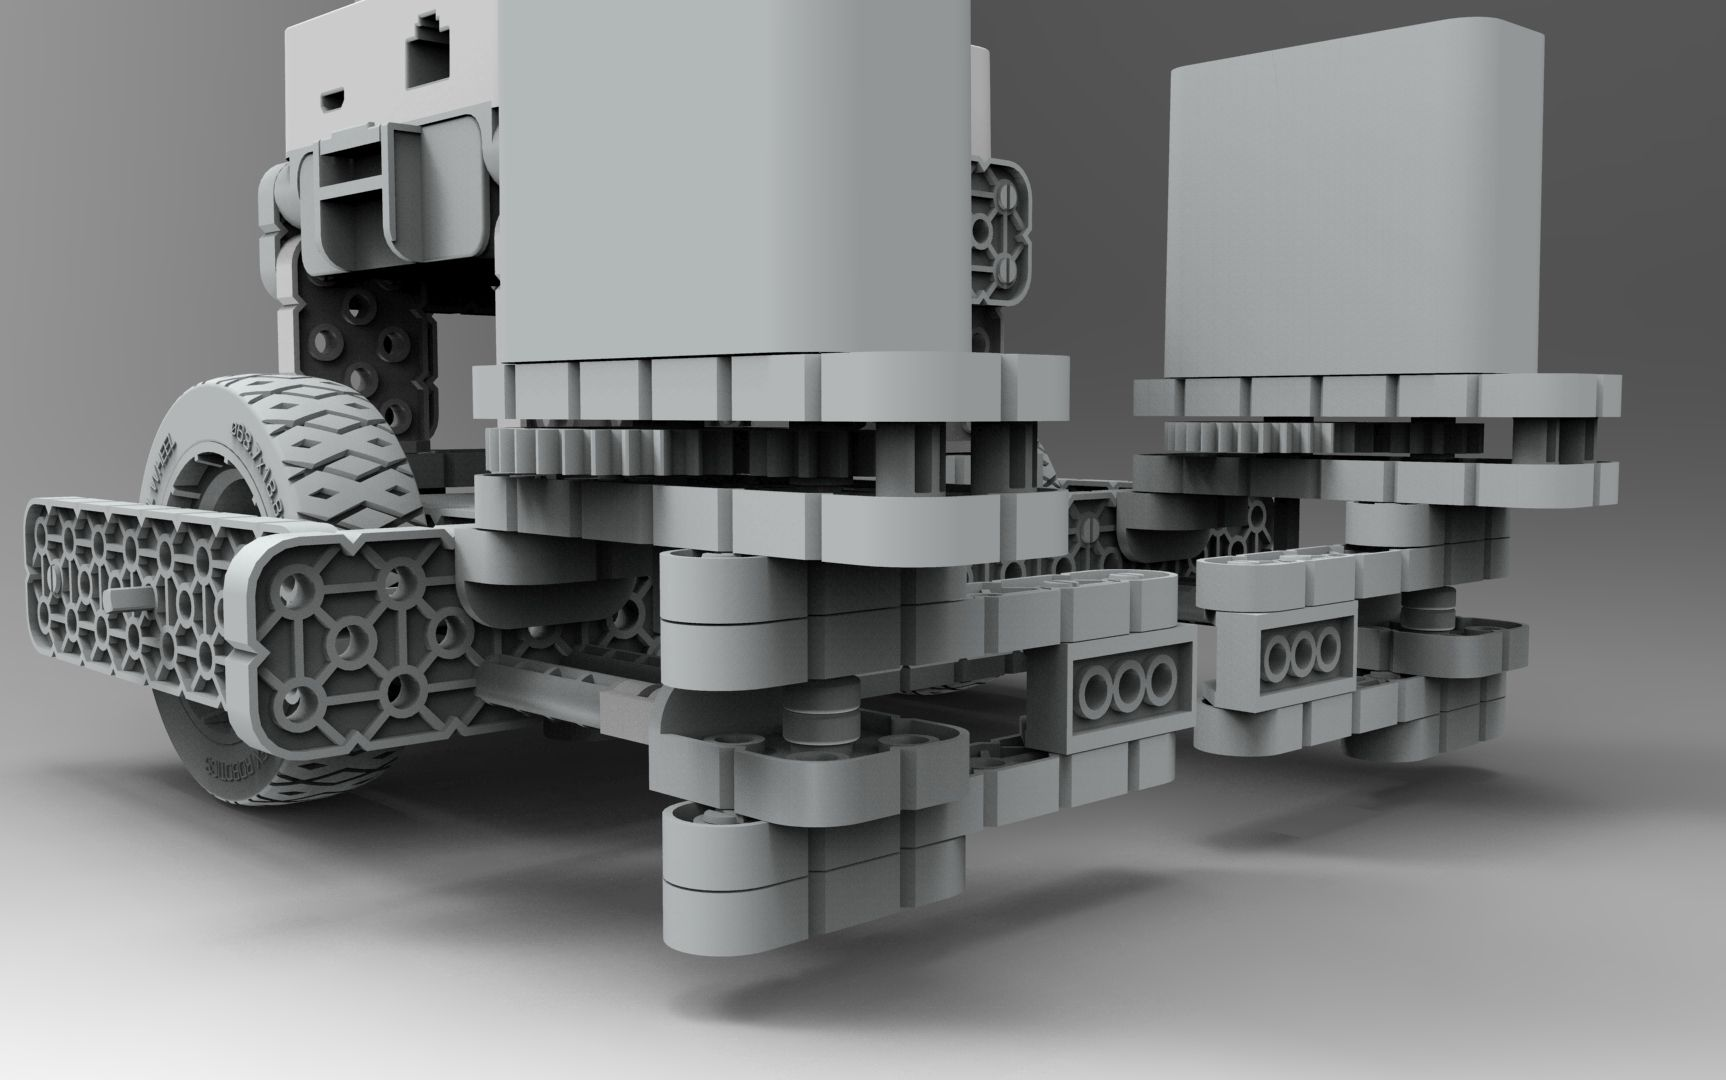 Fabrica-de-nerdes-vex-iq-lucas1-3500-3500